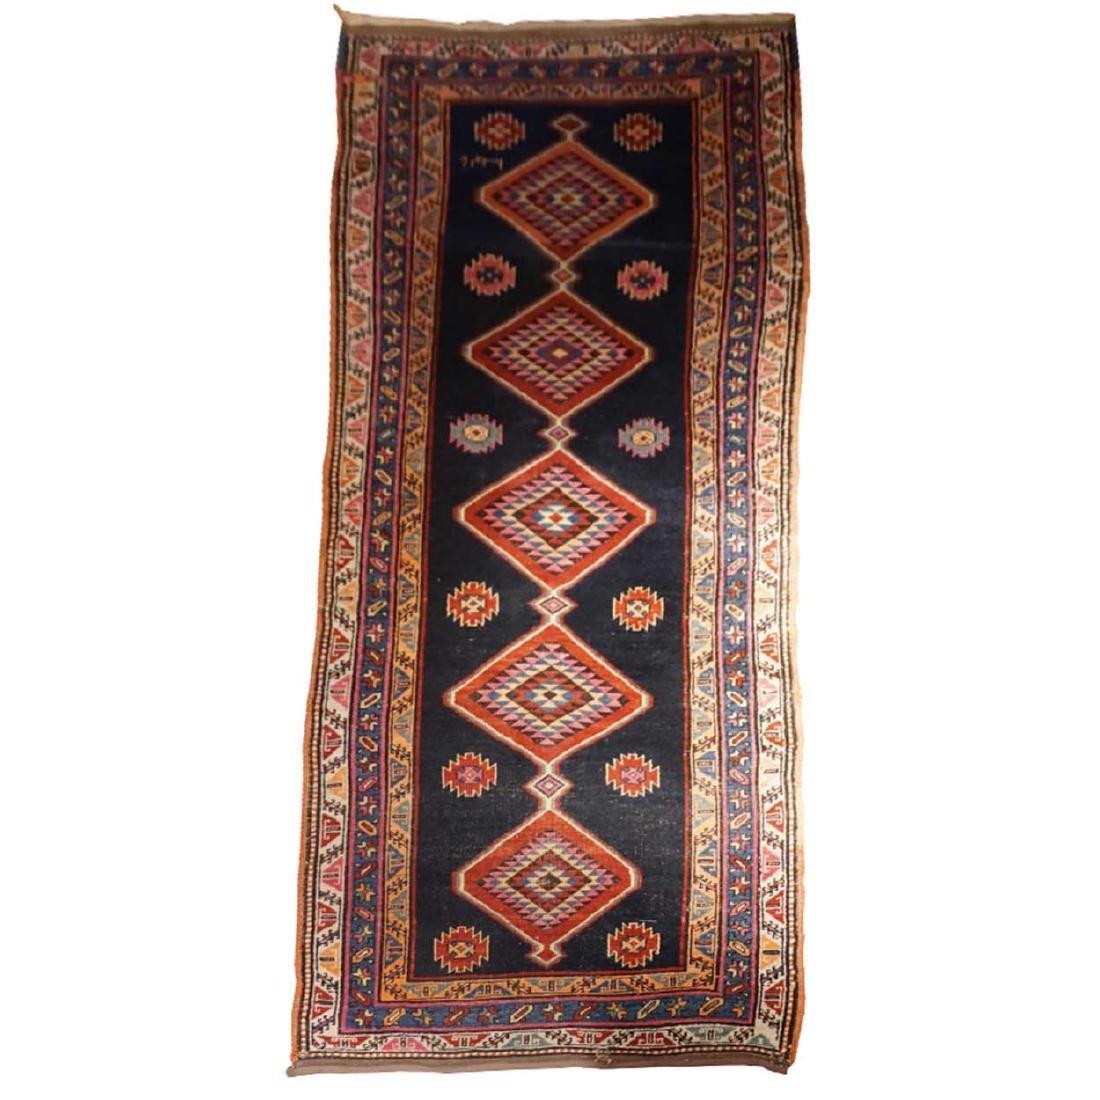 Long Persian Karabagh/Karabakh Runner Carpet